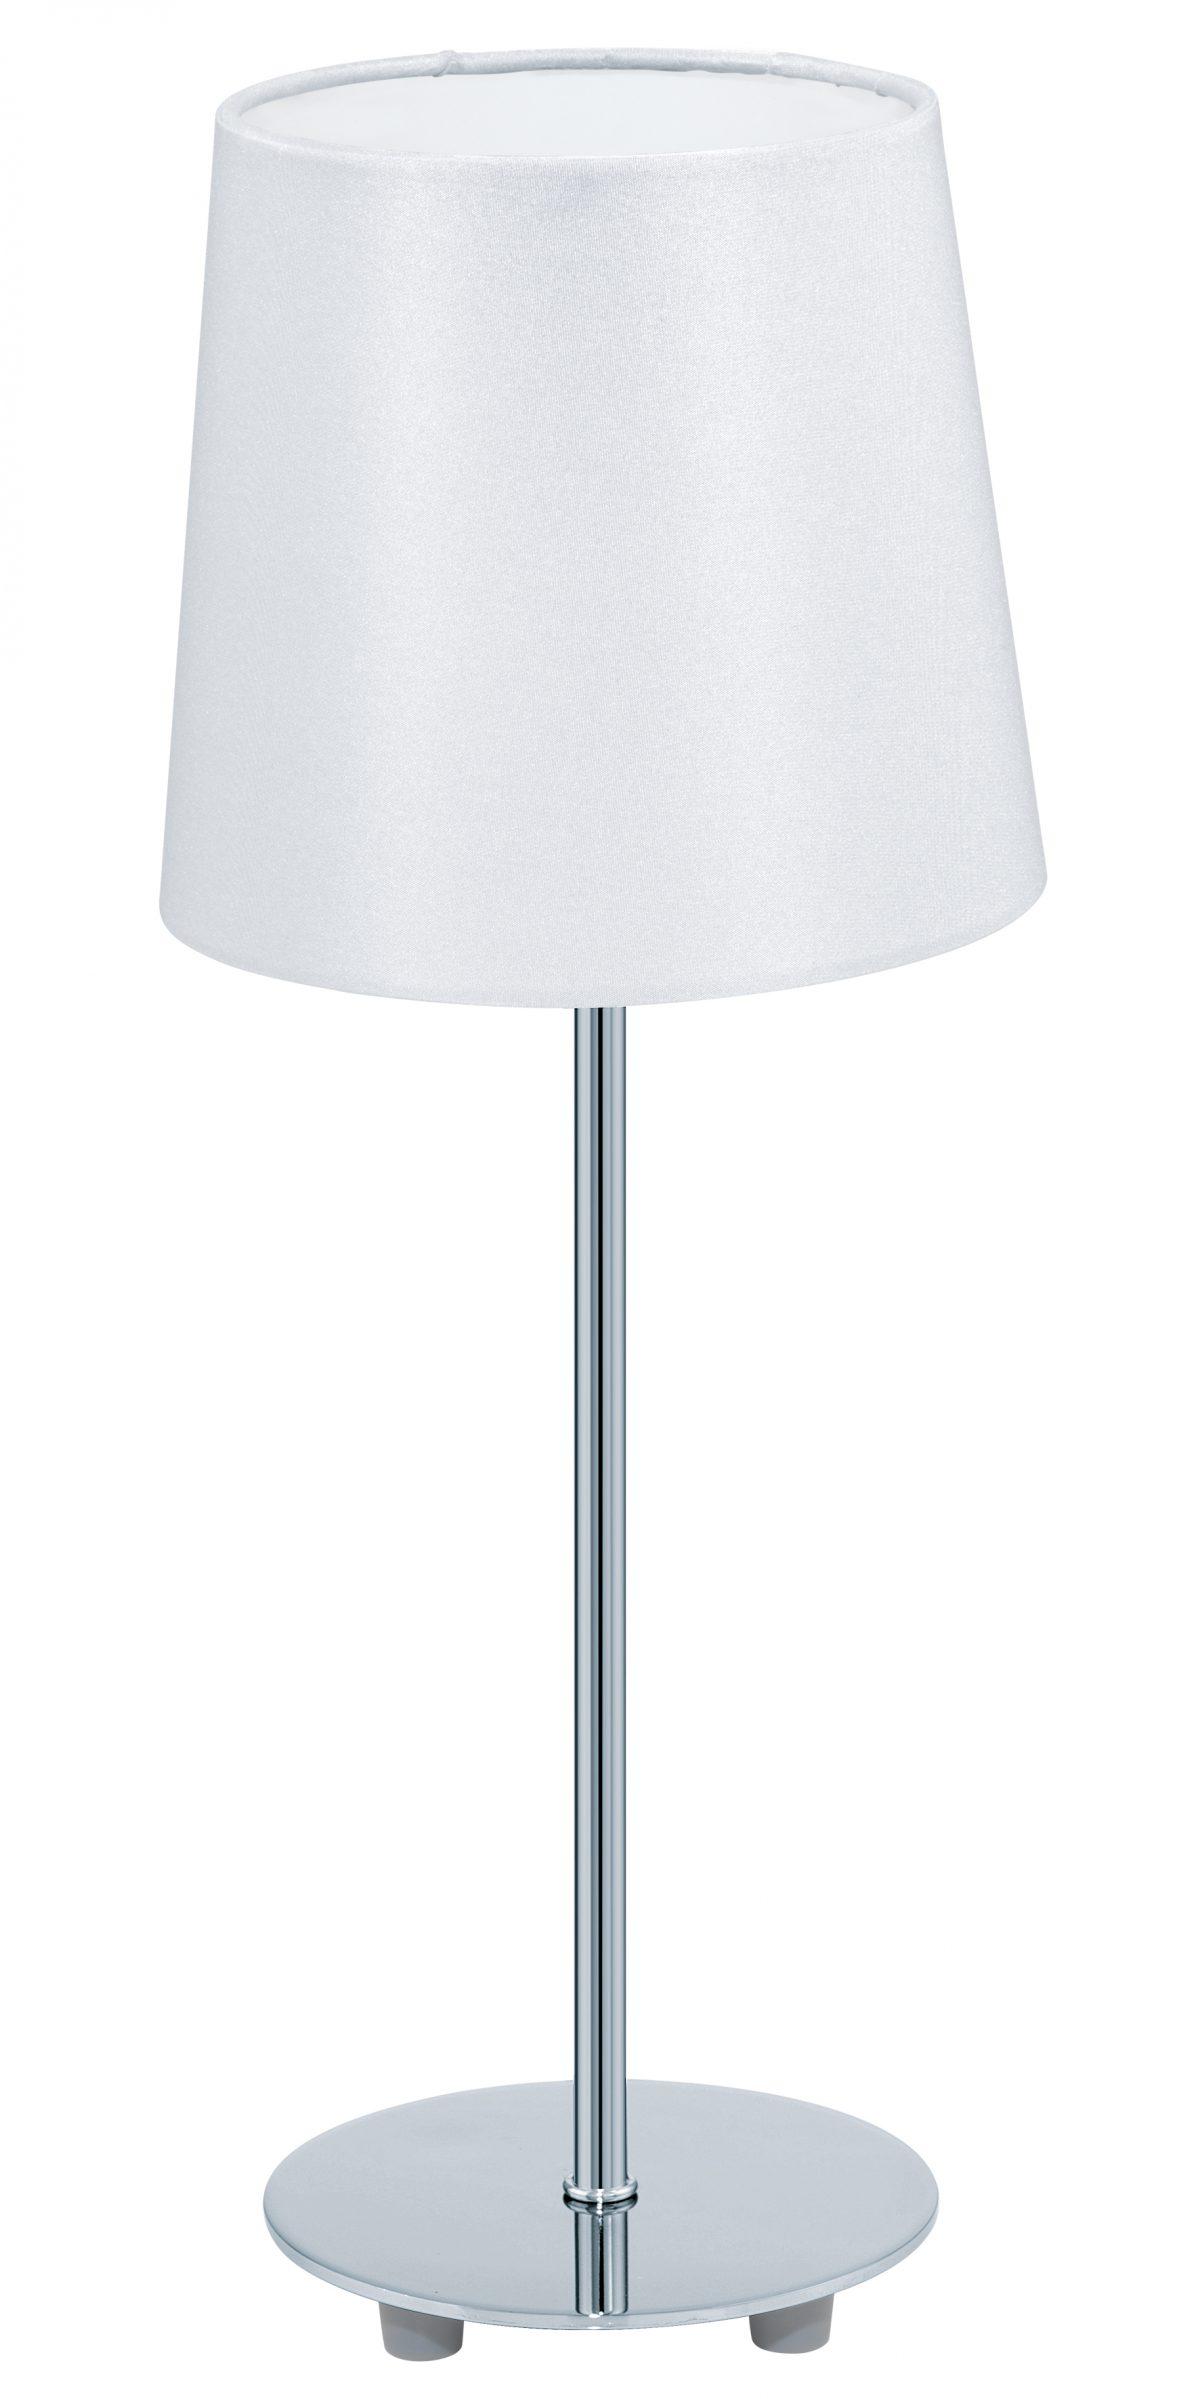 Настольная лампа LAURITZ EGLO 92884 - Фото №28